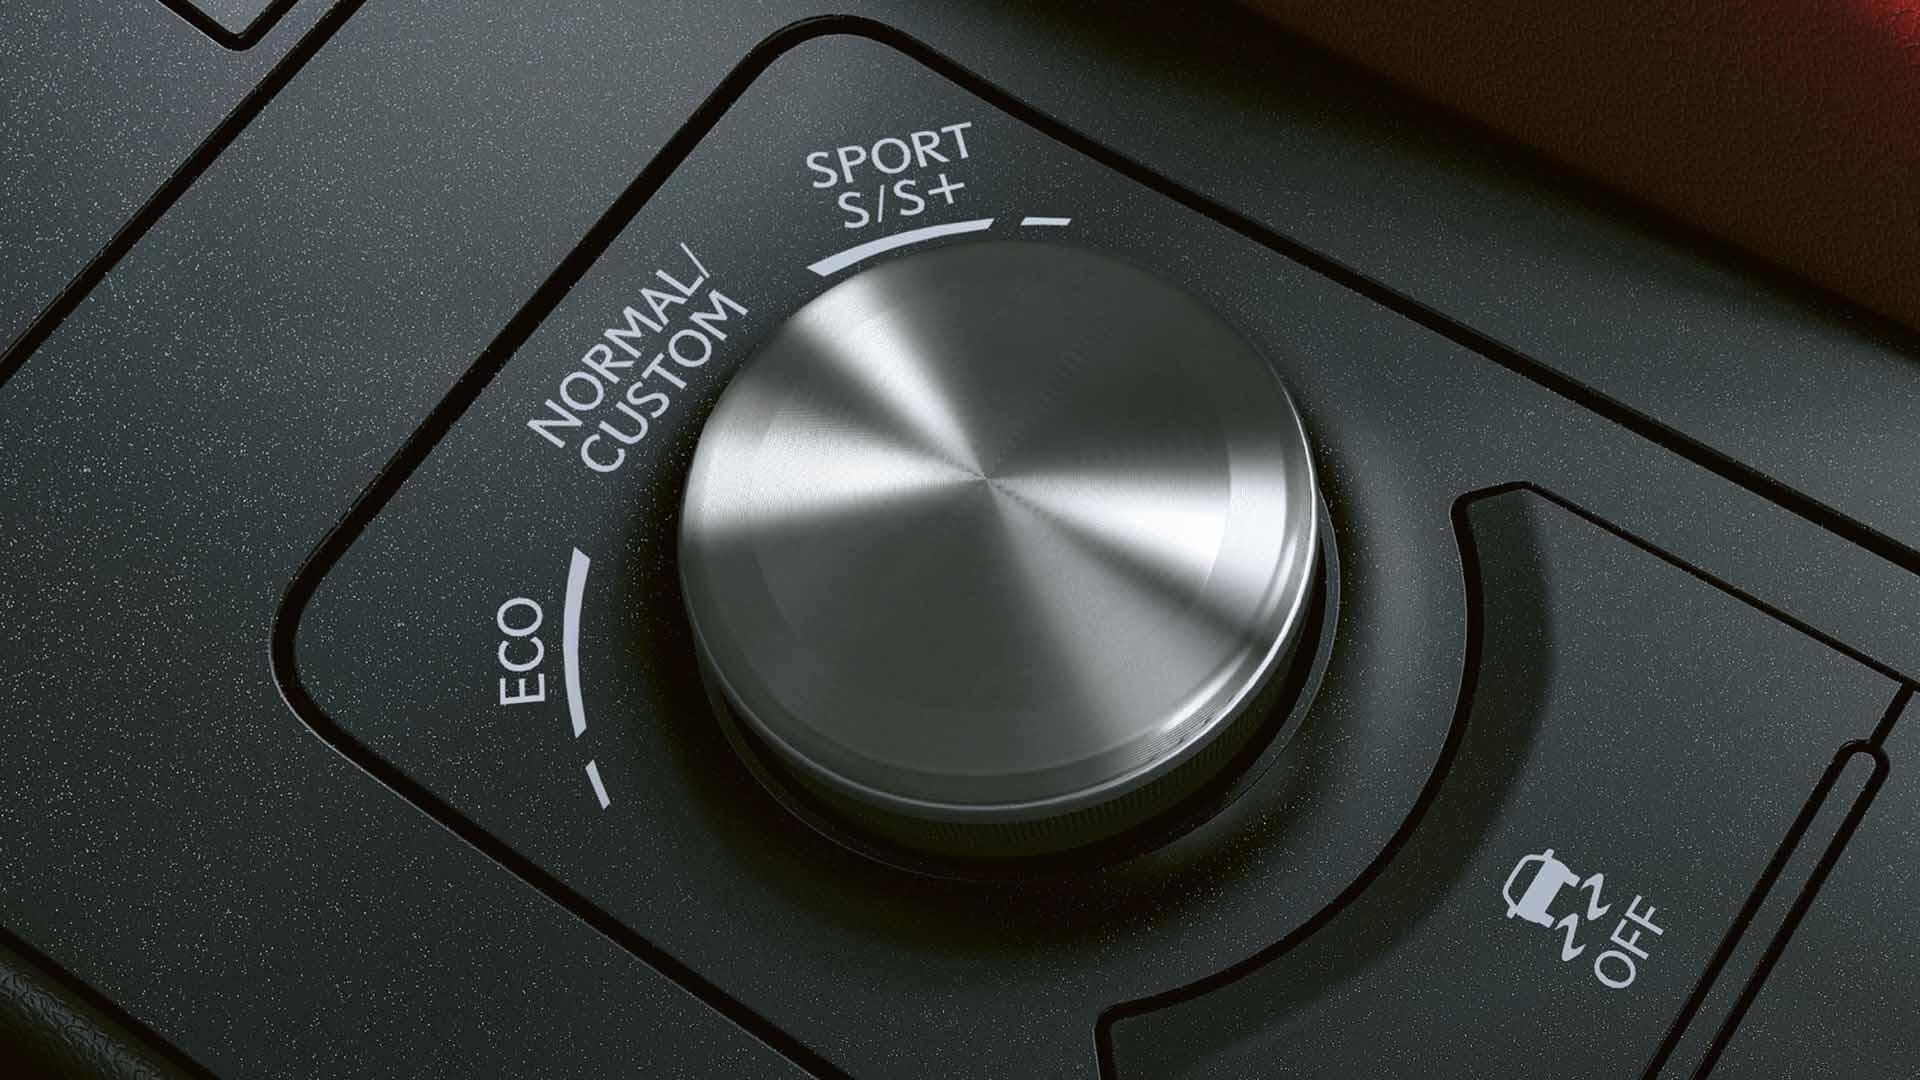 2018 lexus rc hotspot drive mode select 1920x1080 v2